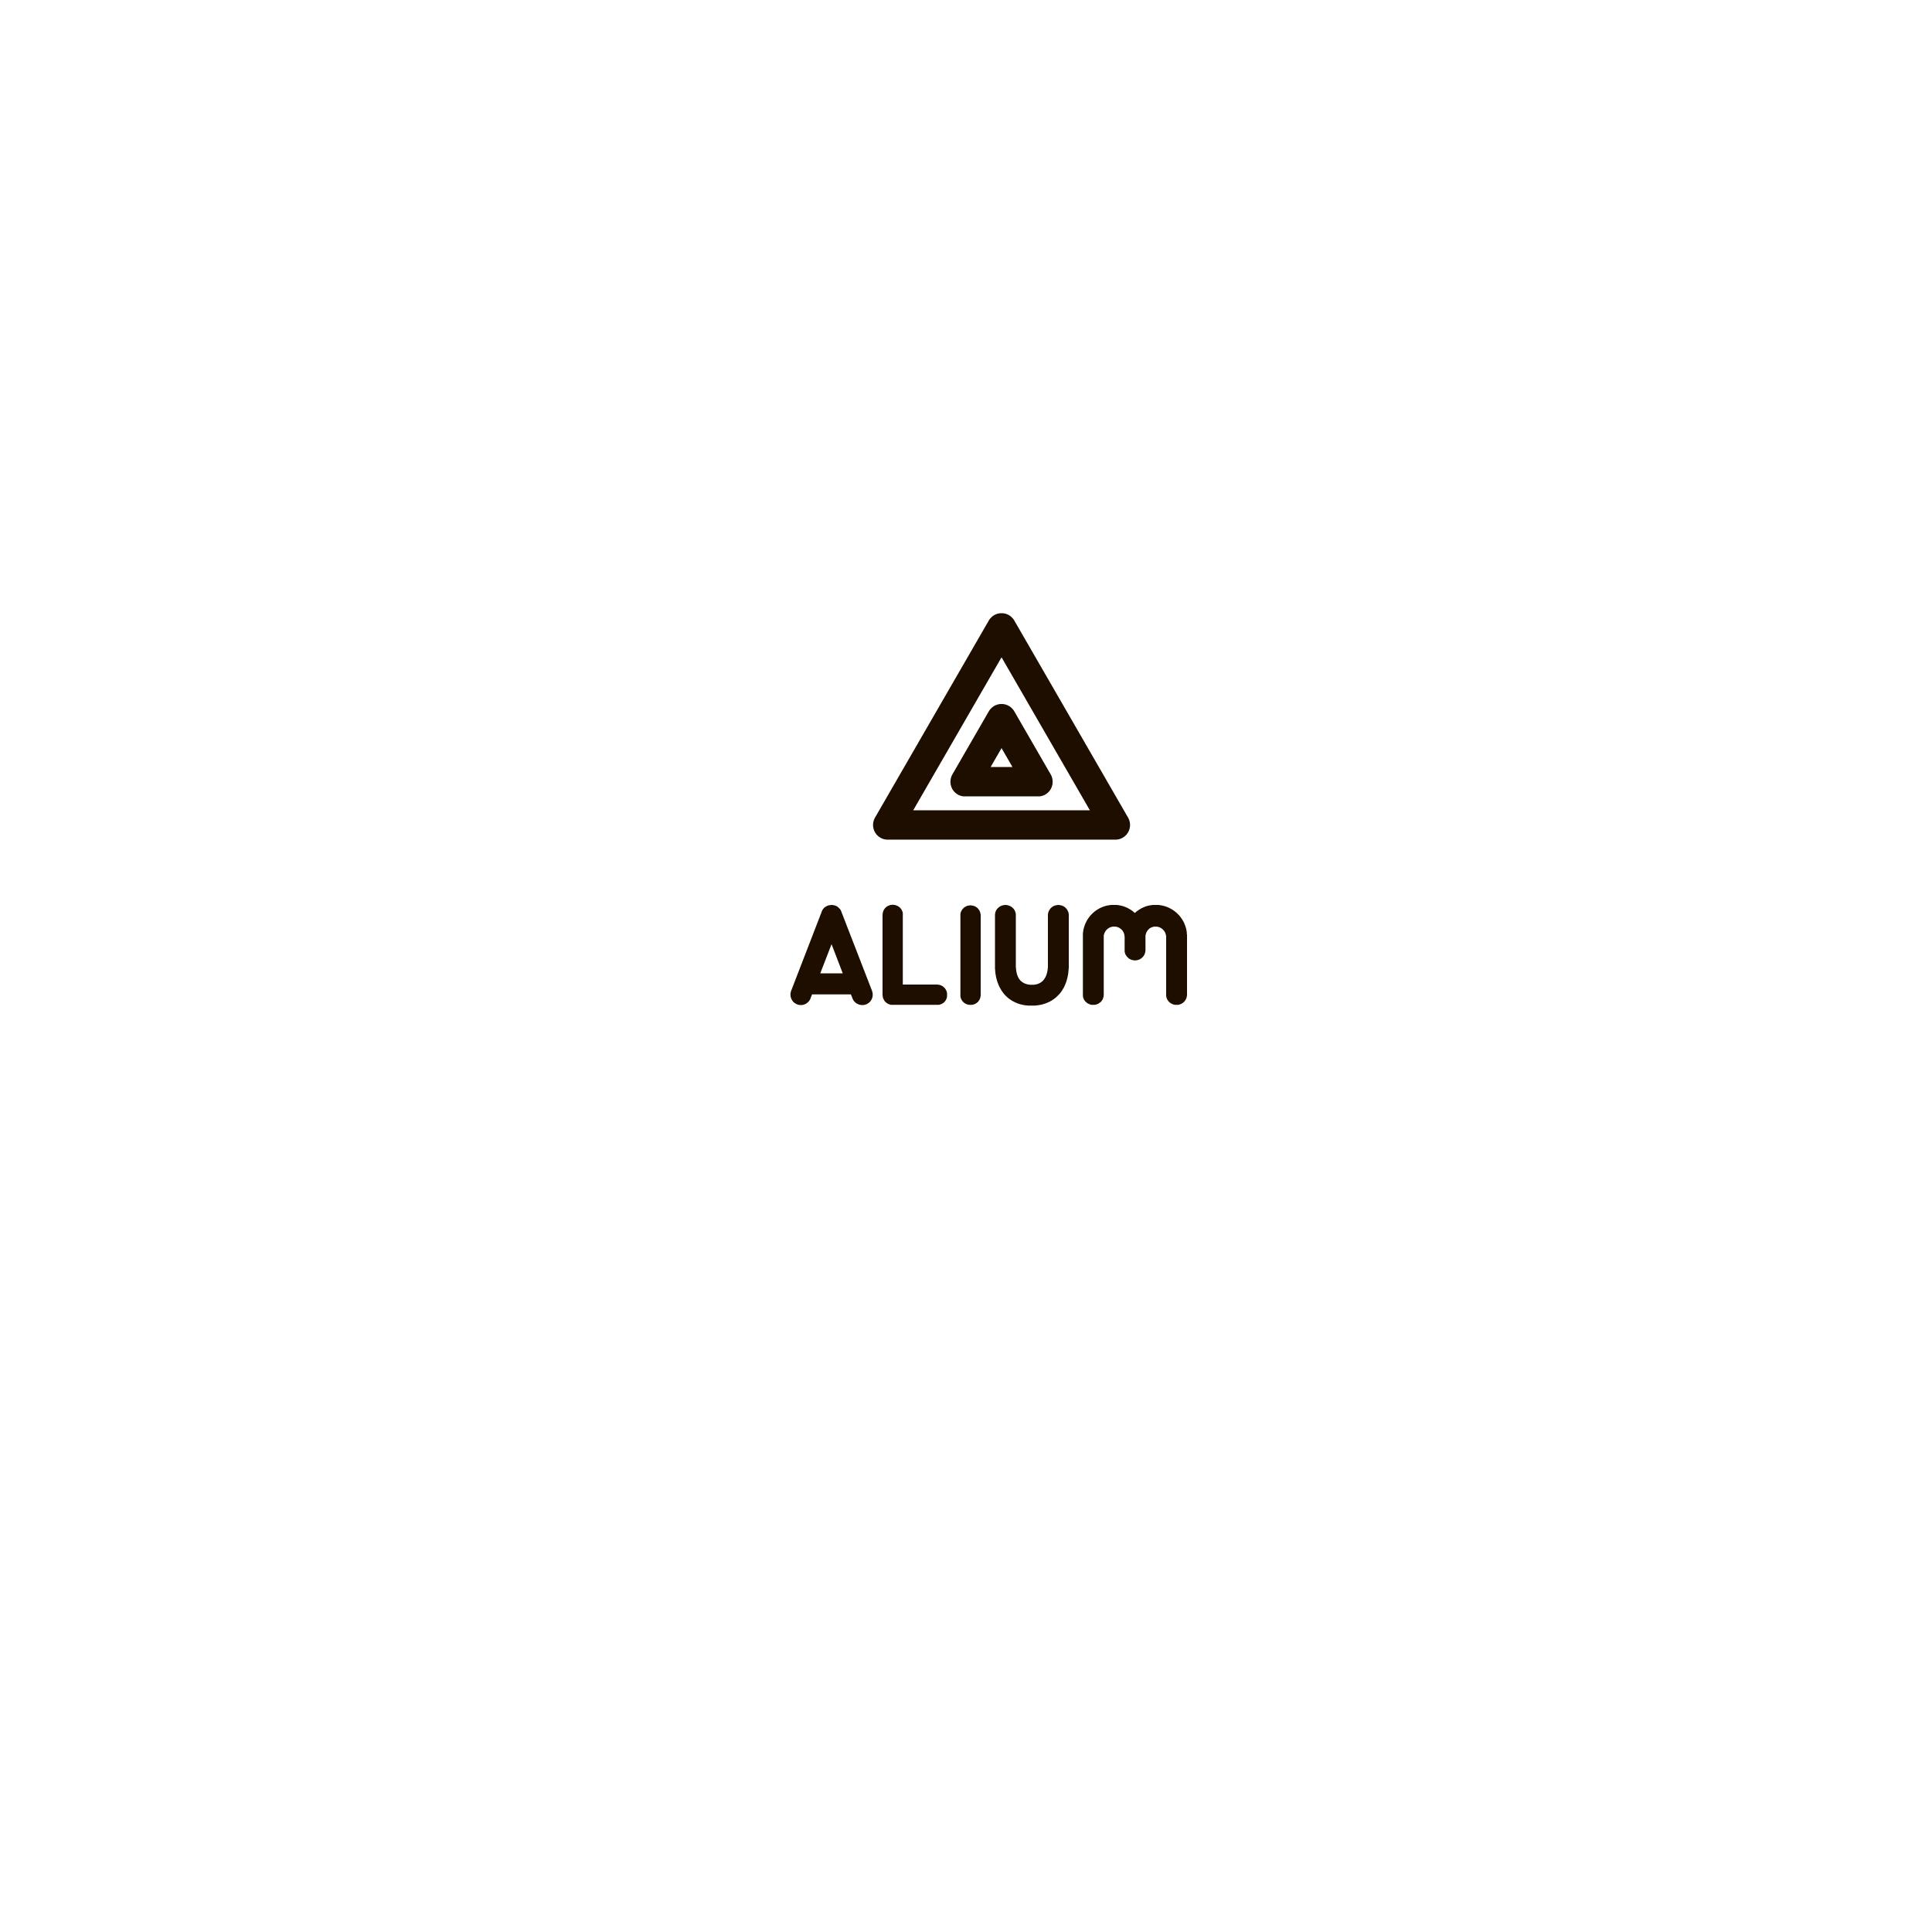 Логотип для дизайн студии фото f_23459e3aa02c3085.jpg